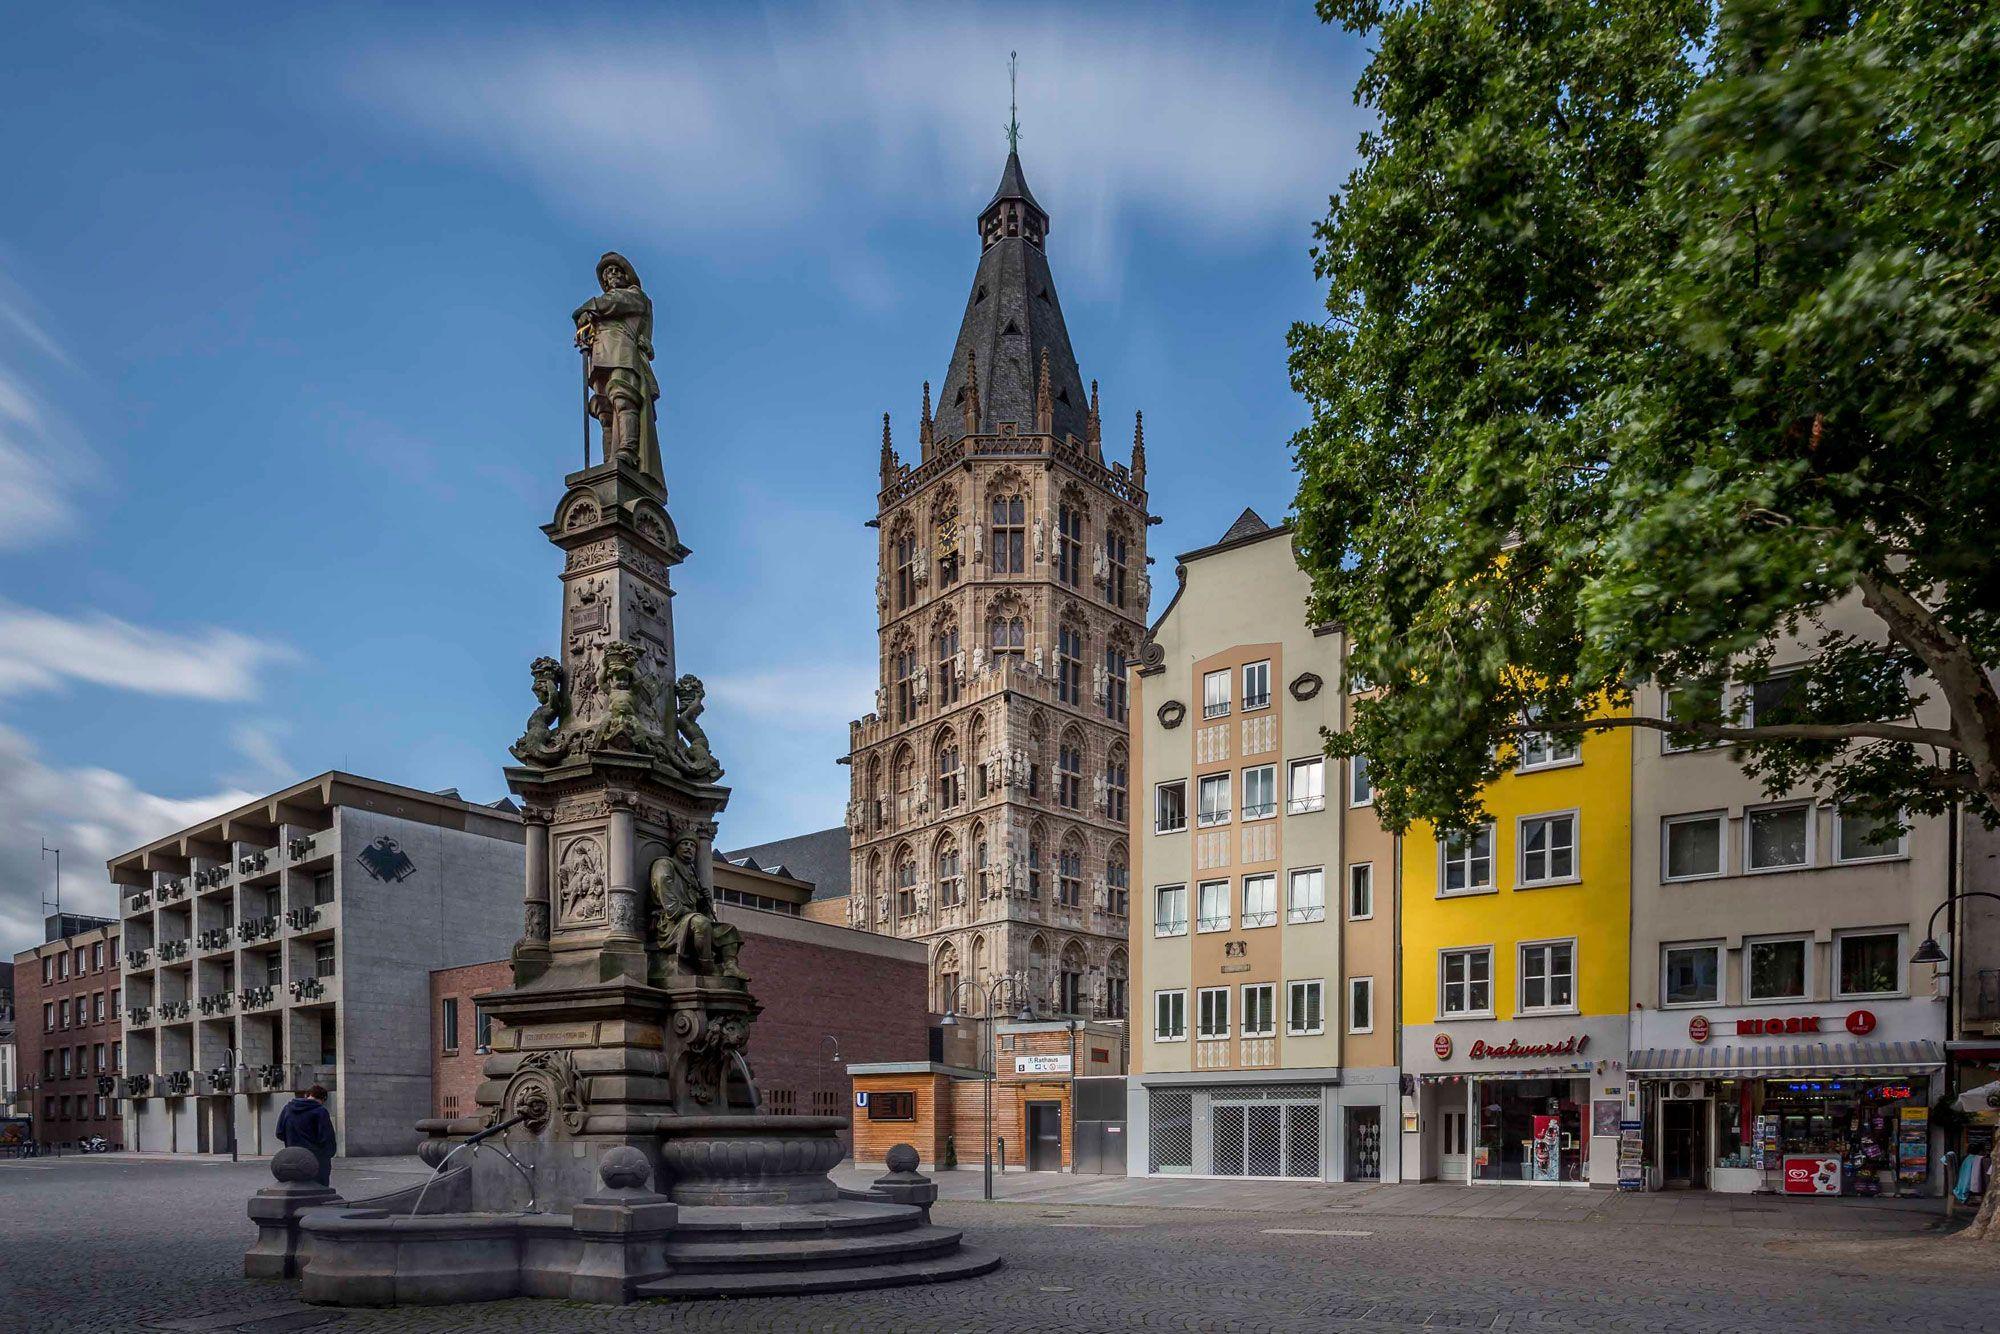 Kolner Altstadt Alter Markt Und Rathausturm Cologne S Old Town Alter Markt And City Hall Tower C Jens Korte Kolntourismus Gmbh Altstadt Rathaus Turm